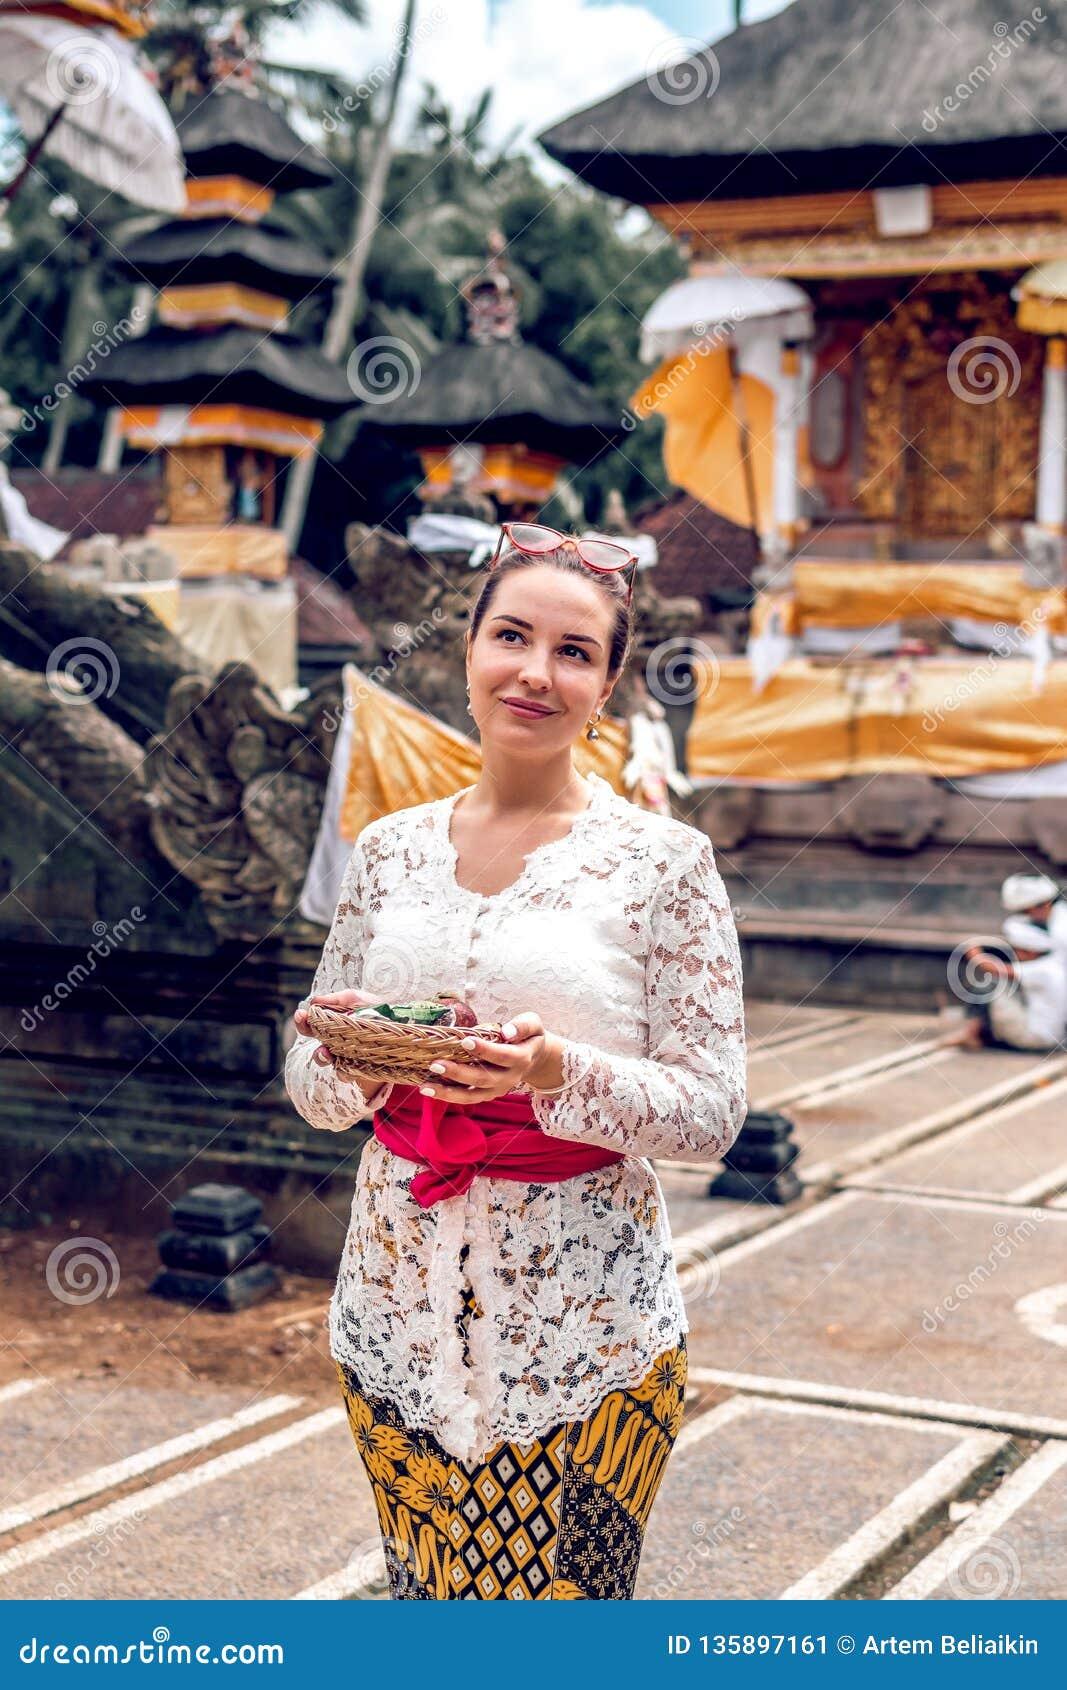 Bali Indonesia December 26 2018 European Woman In